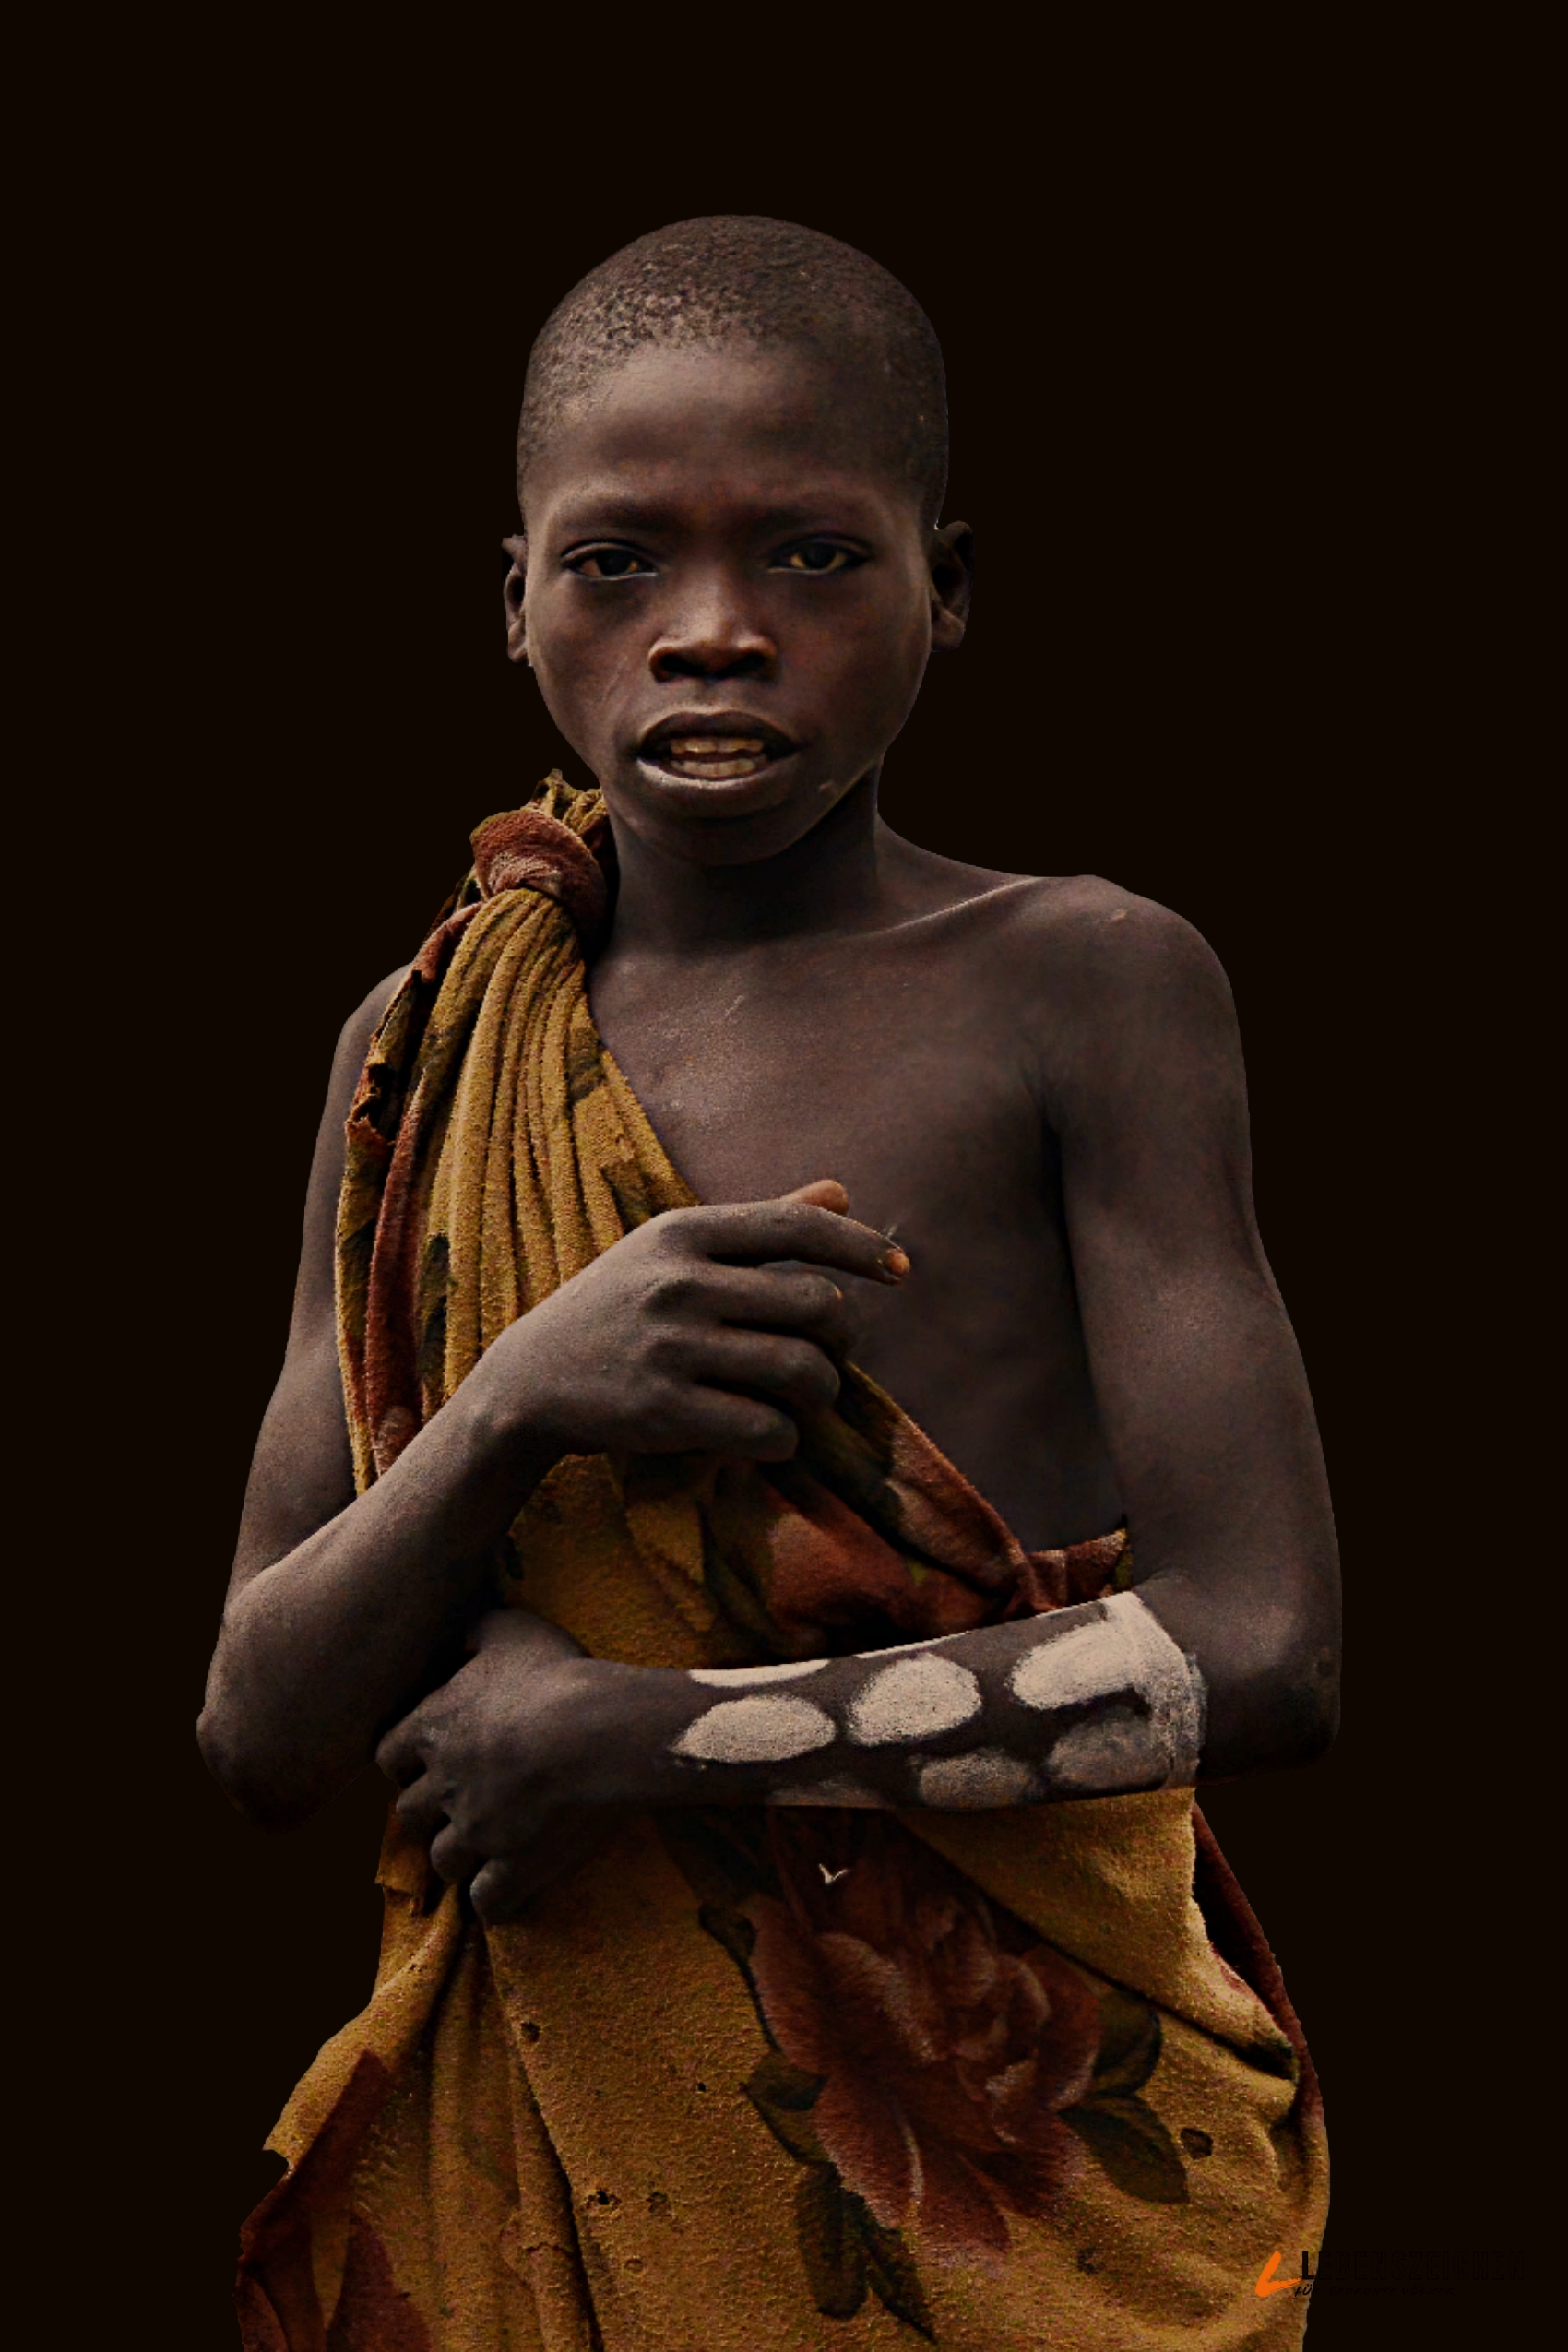 c Rod Waddington, Suri Junge, Äthopien